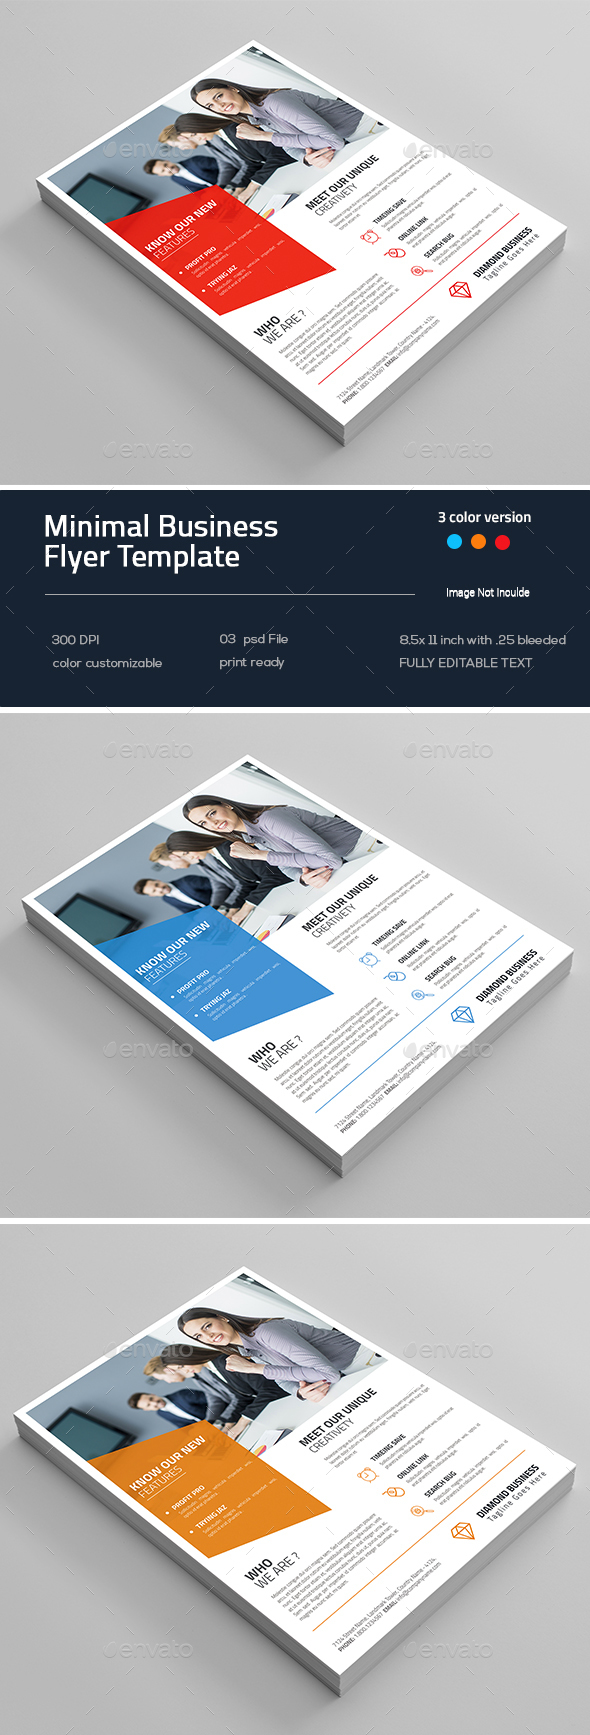 Minimal Business Flyer - Flyers Print Templates